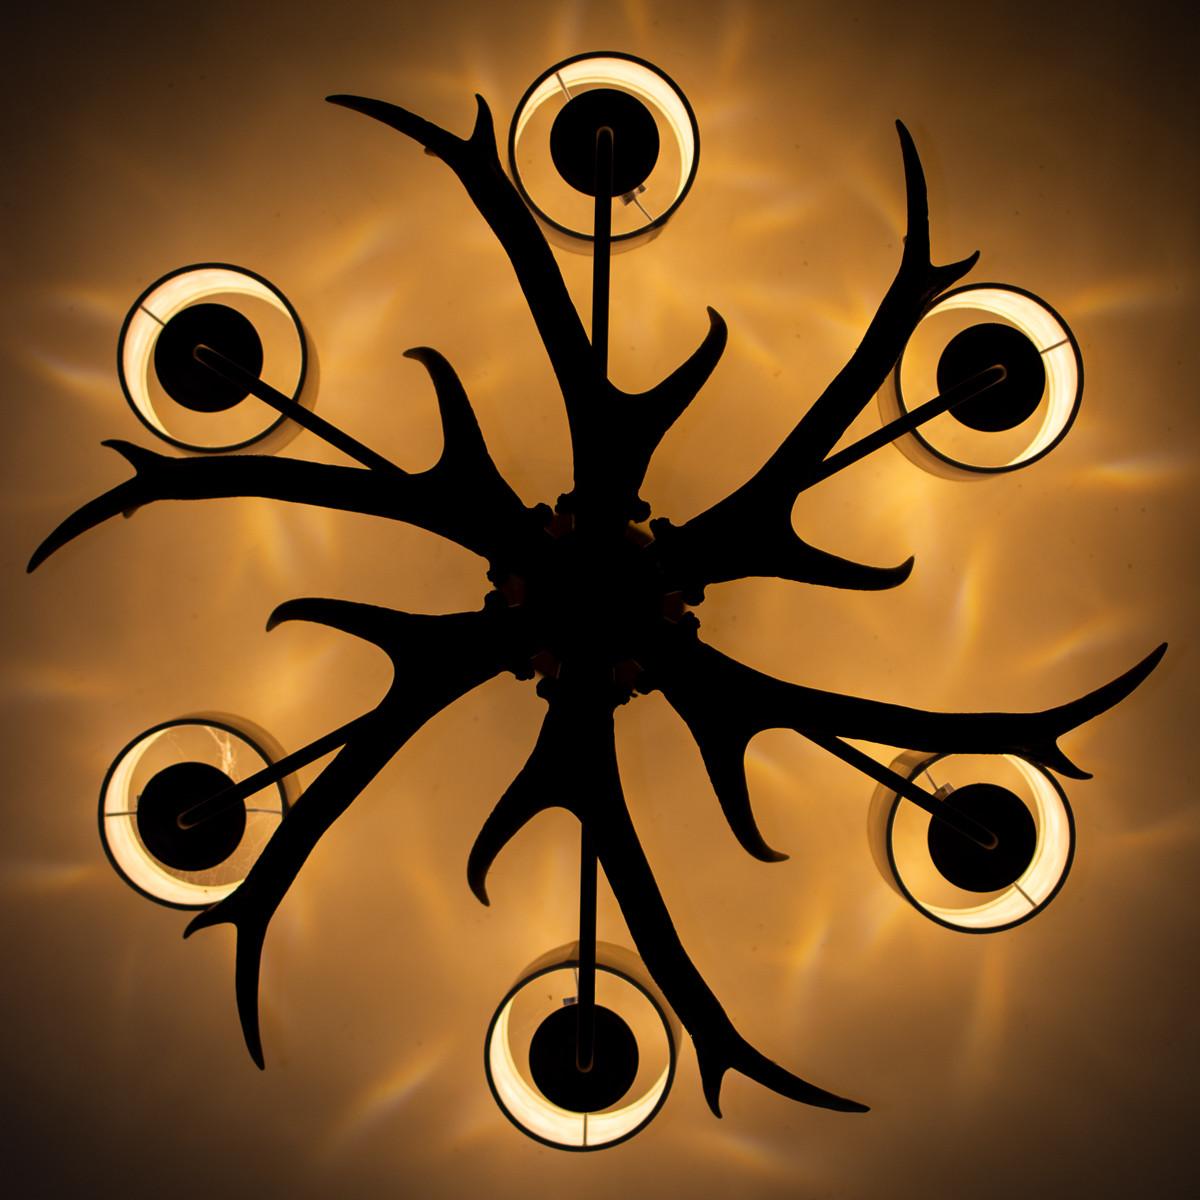 PDI - Ceiling Light by Steve Stewart (10.5 marks)